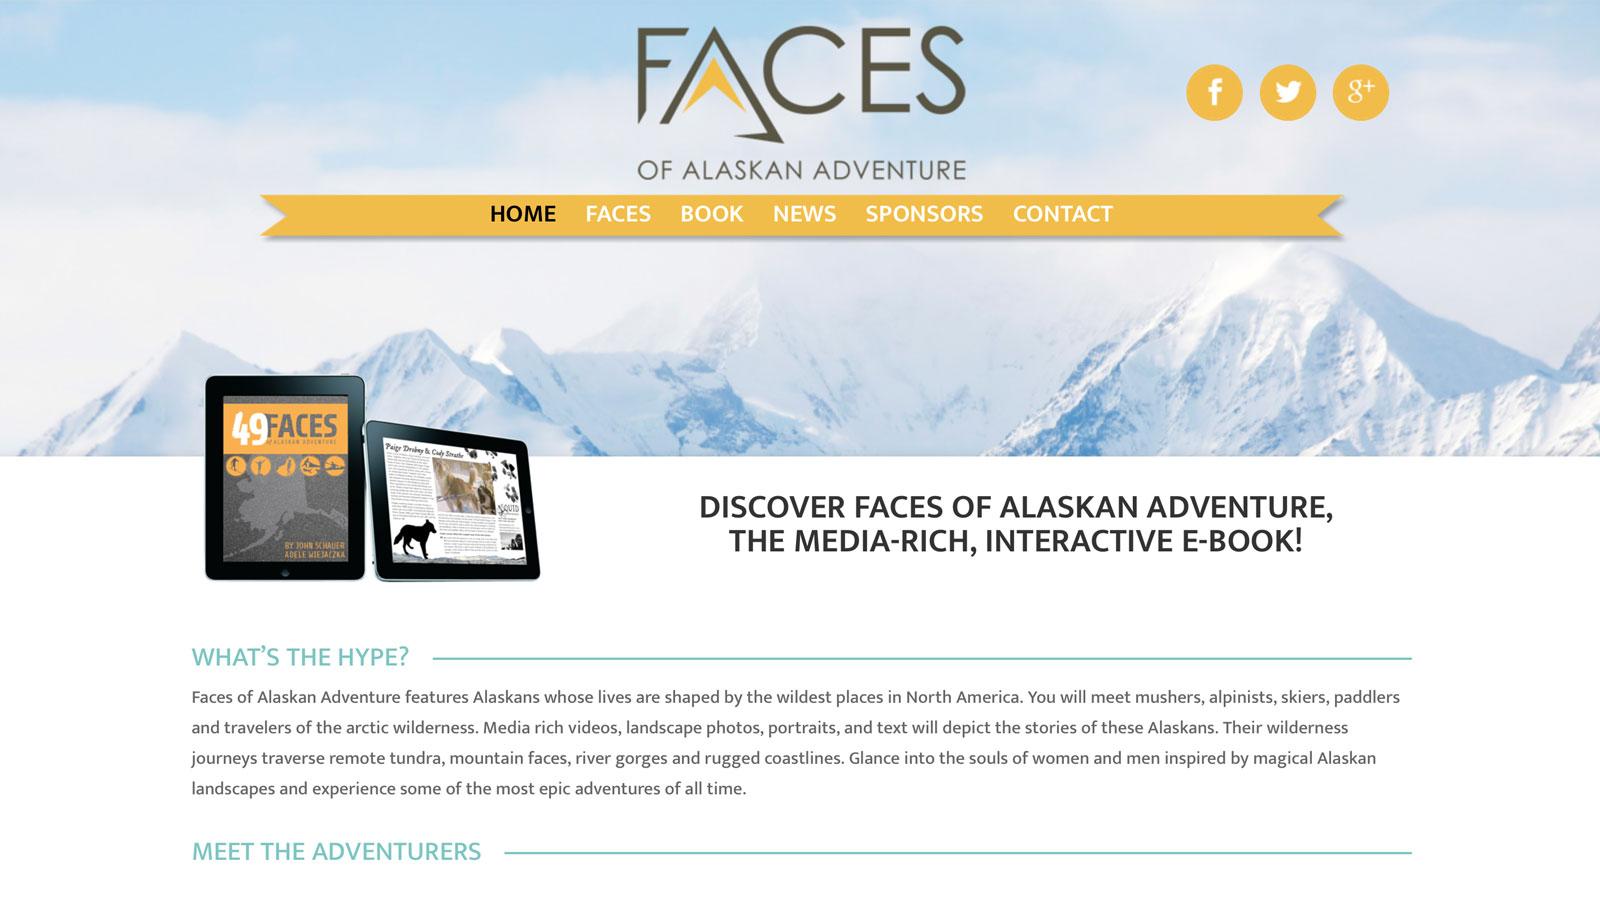 49faces